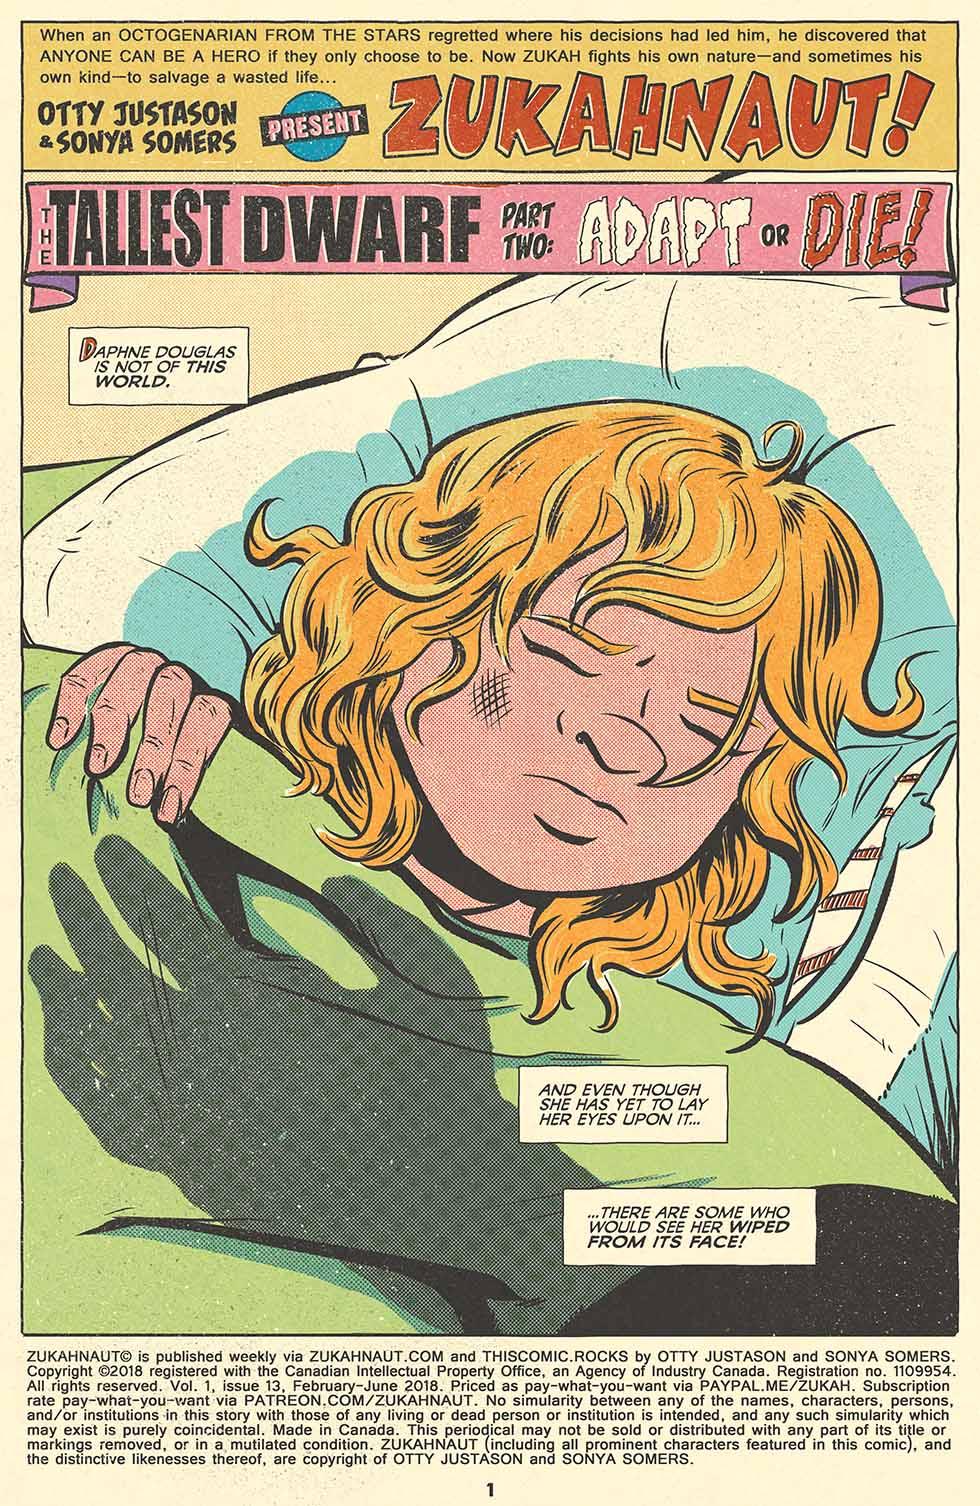 #263 – Oblivious Sleeper